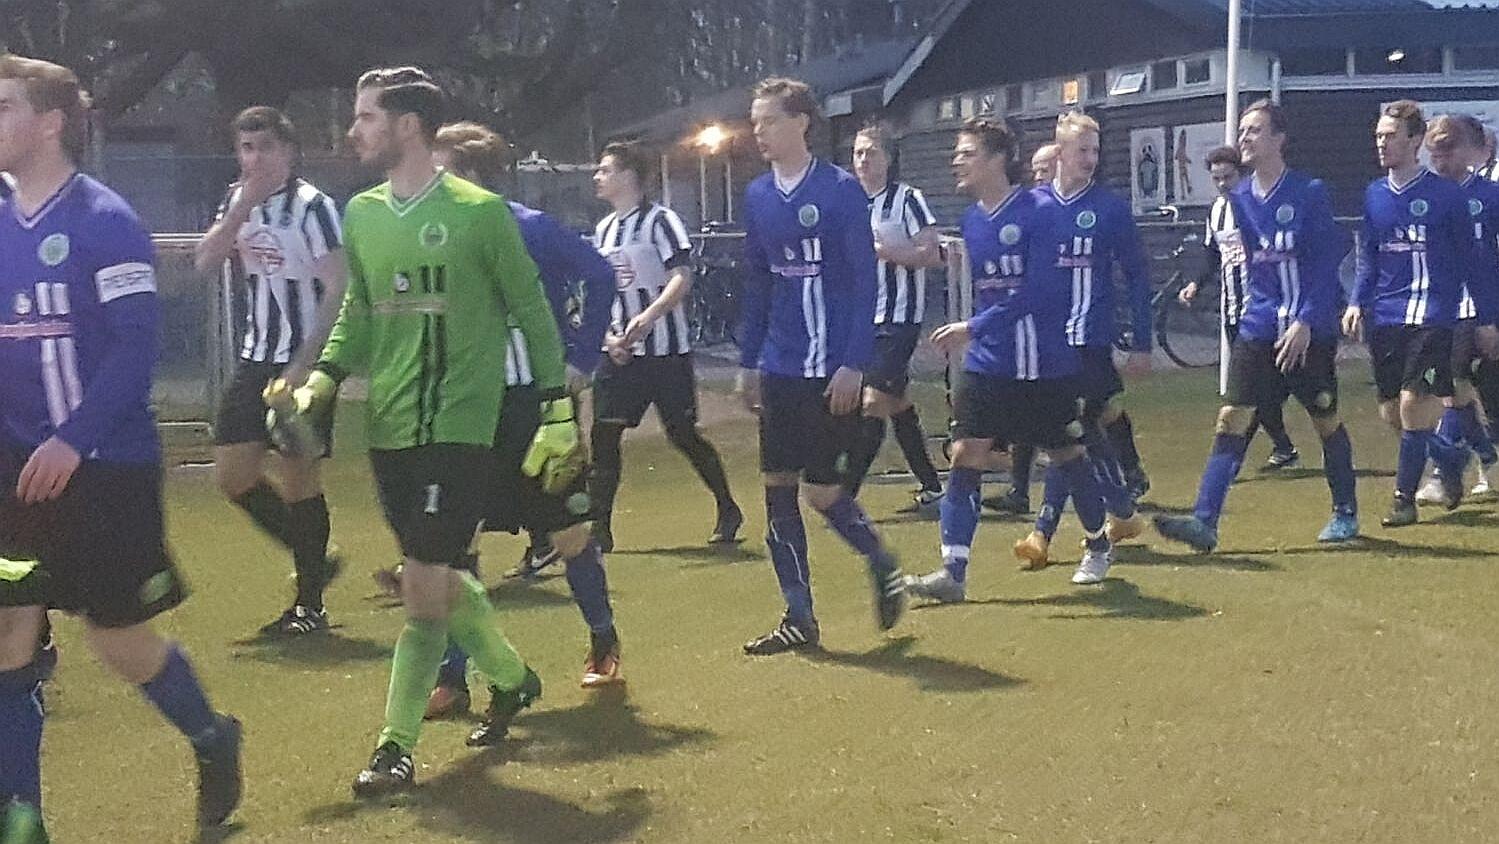 IJmuiden - VEW - Voetbal in Haarlem